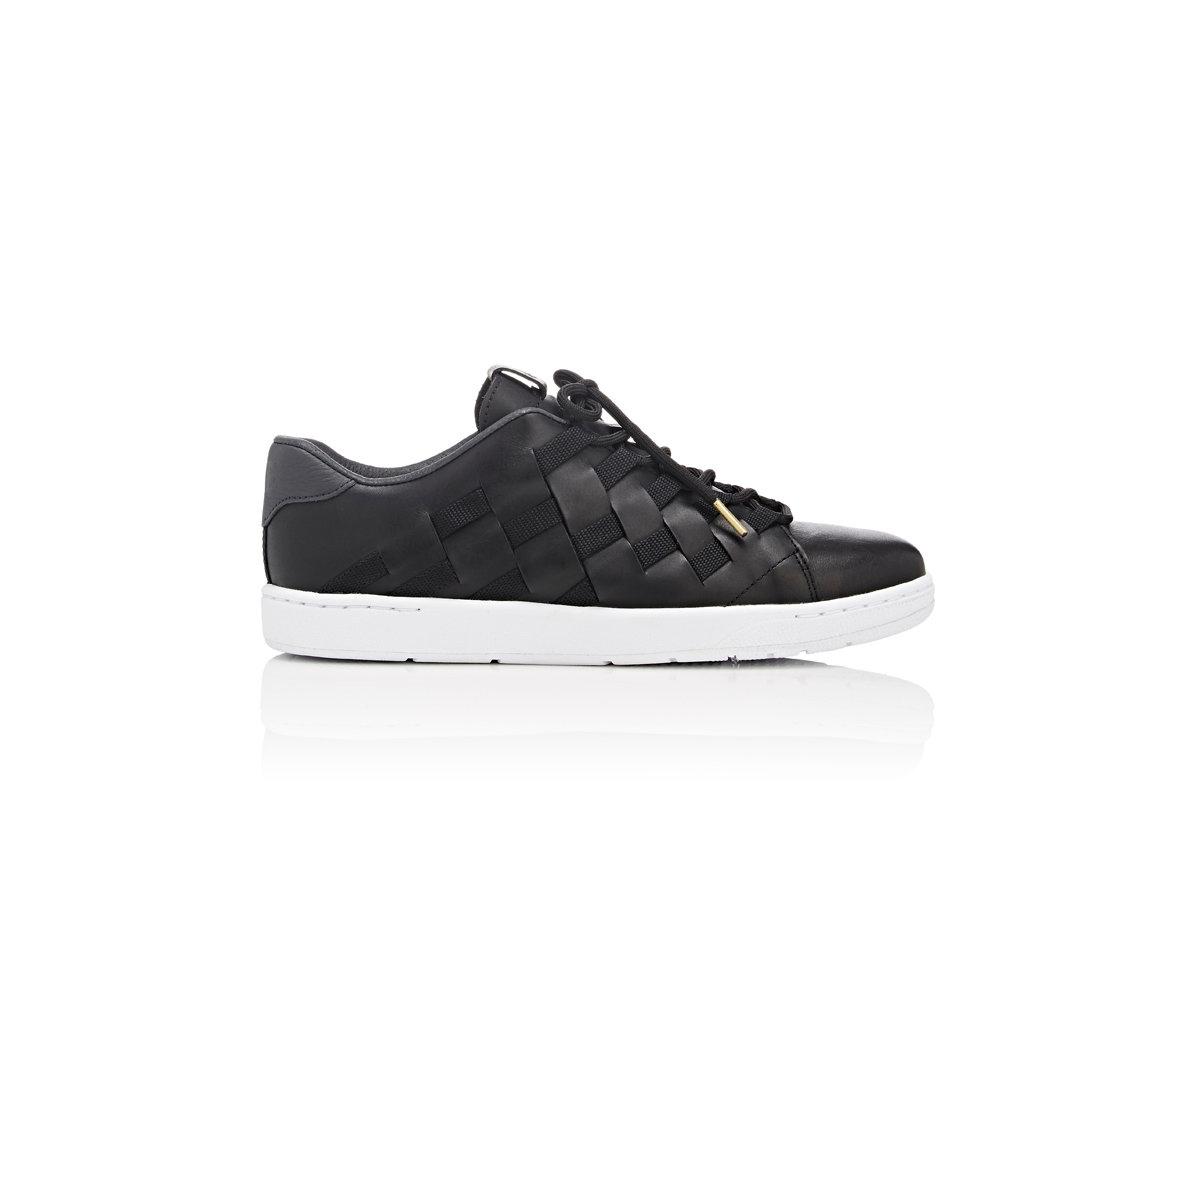 Nike Mens Classic Ultra Tennis Shoes